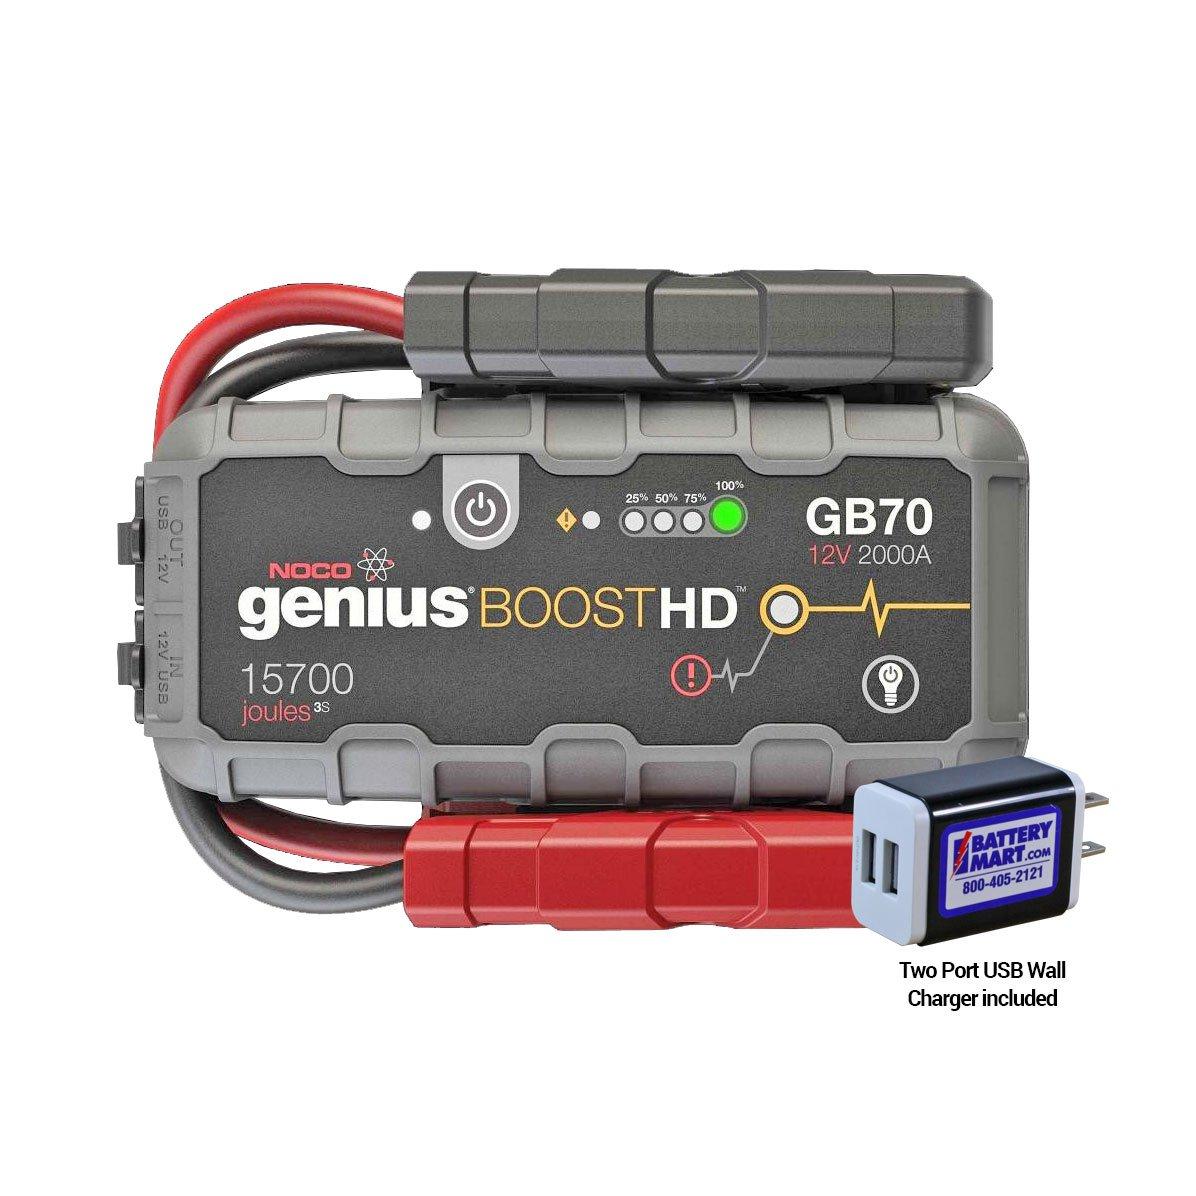 noco genius boost hd 2000a lithium jump starter for pickup trucks suvs many diesel engines. Black Bedroom Furniture Sets. Home Design Ideas